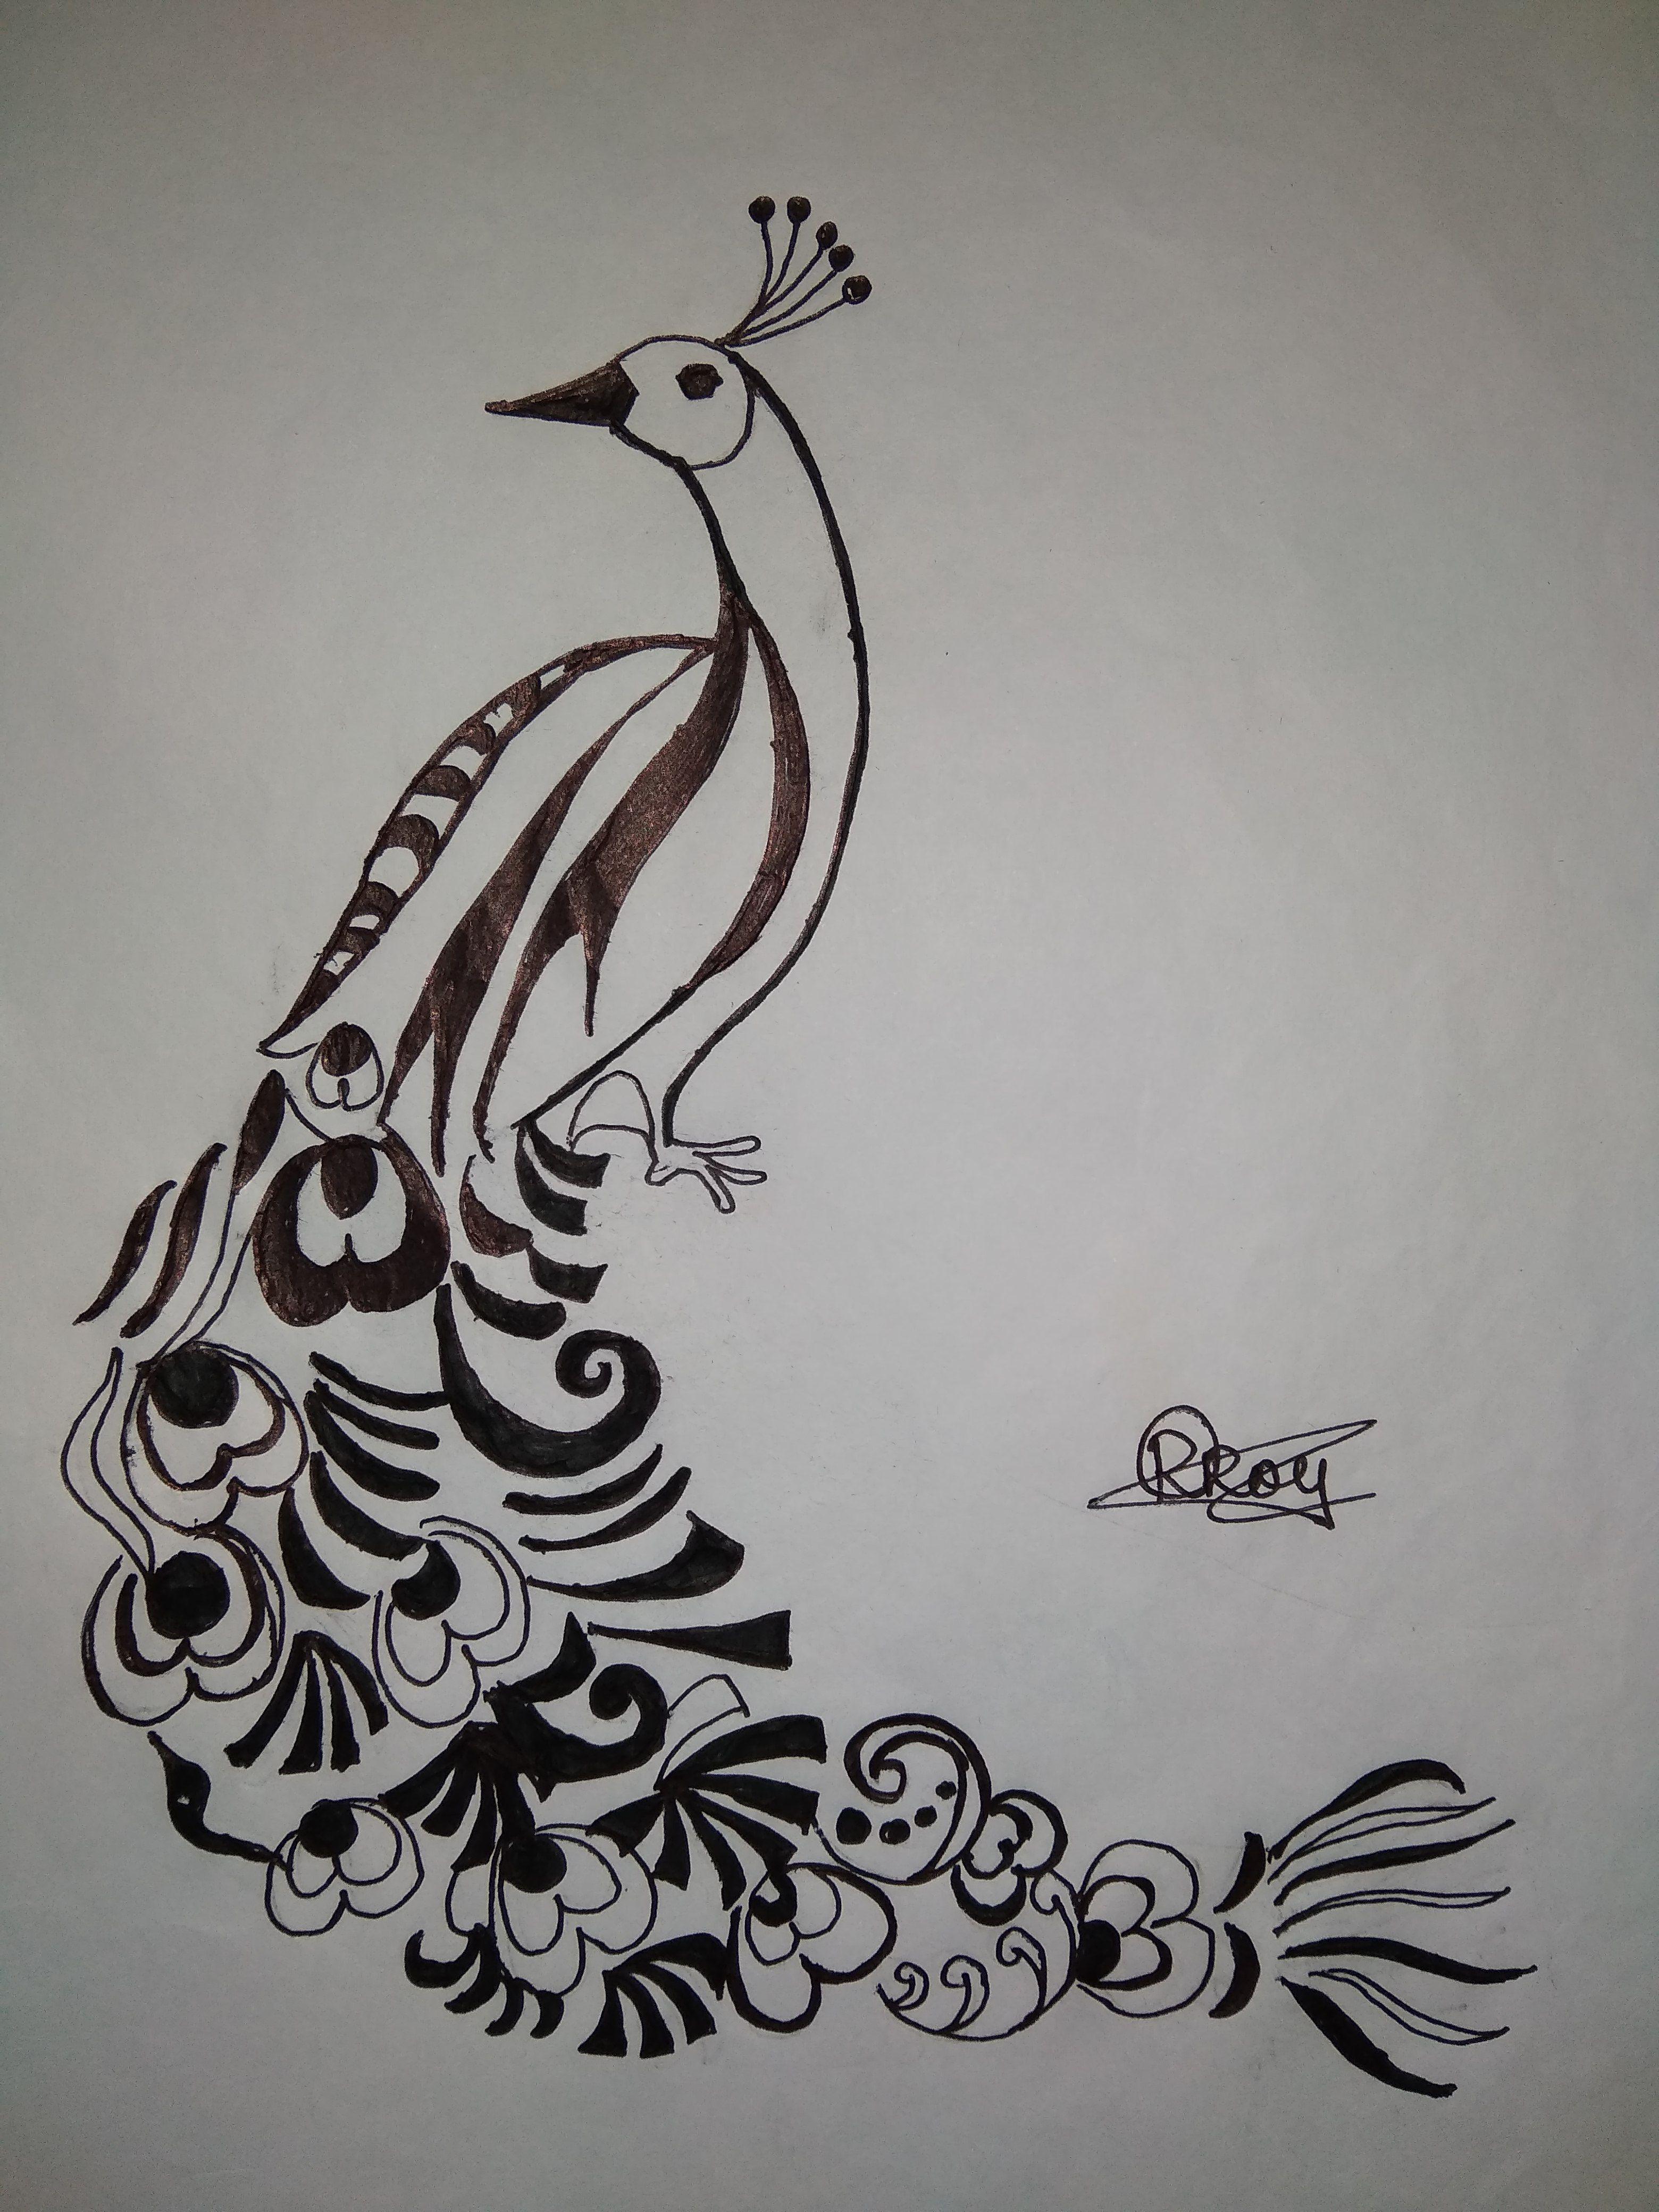 Artsketch peacock drawings pencil drawing of peacock · pencil